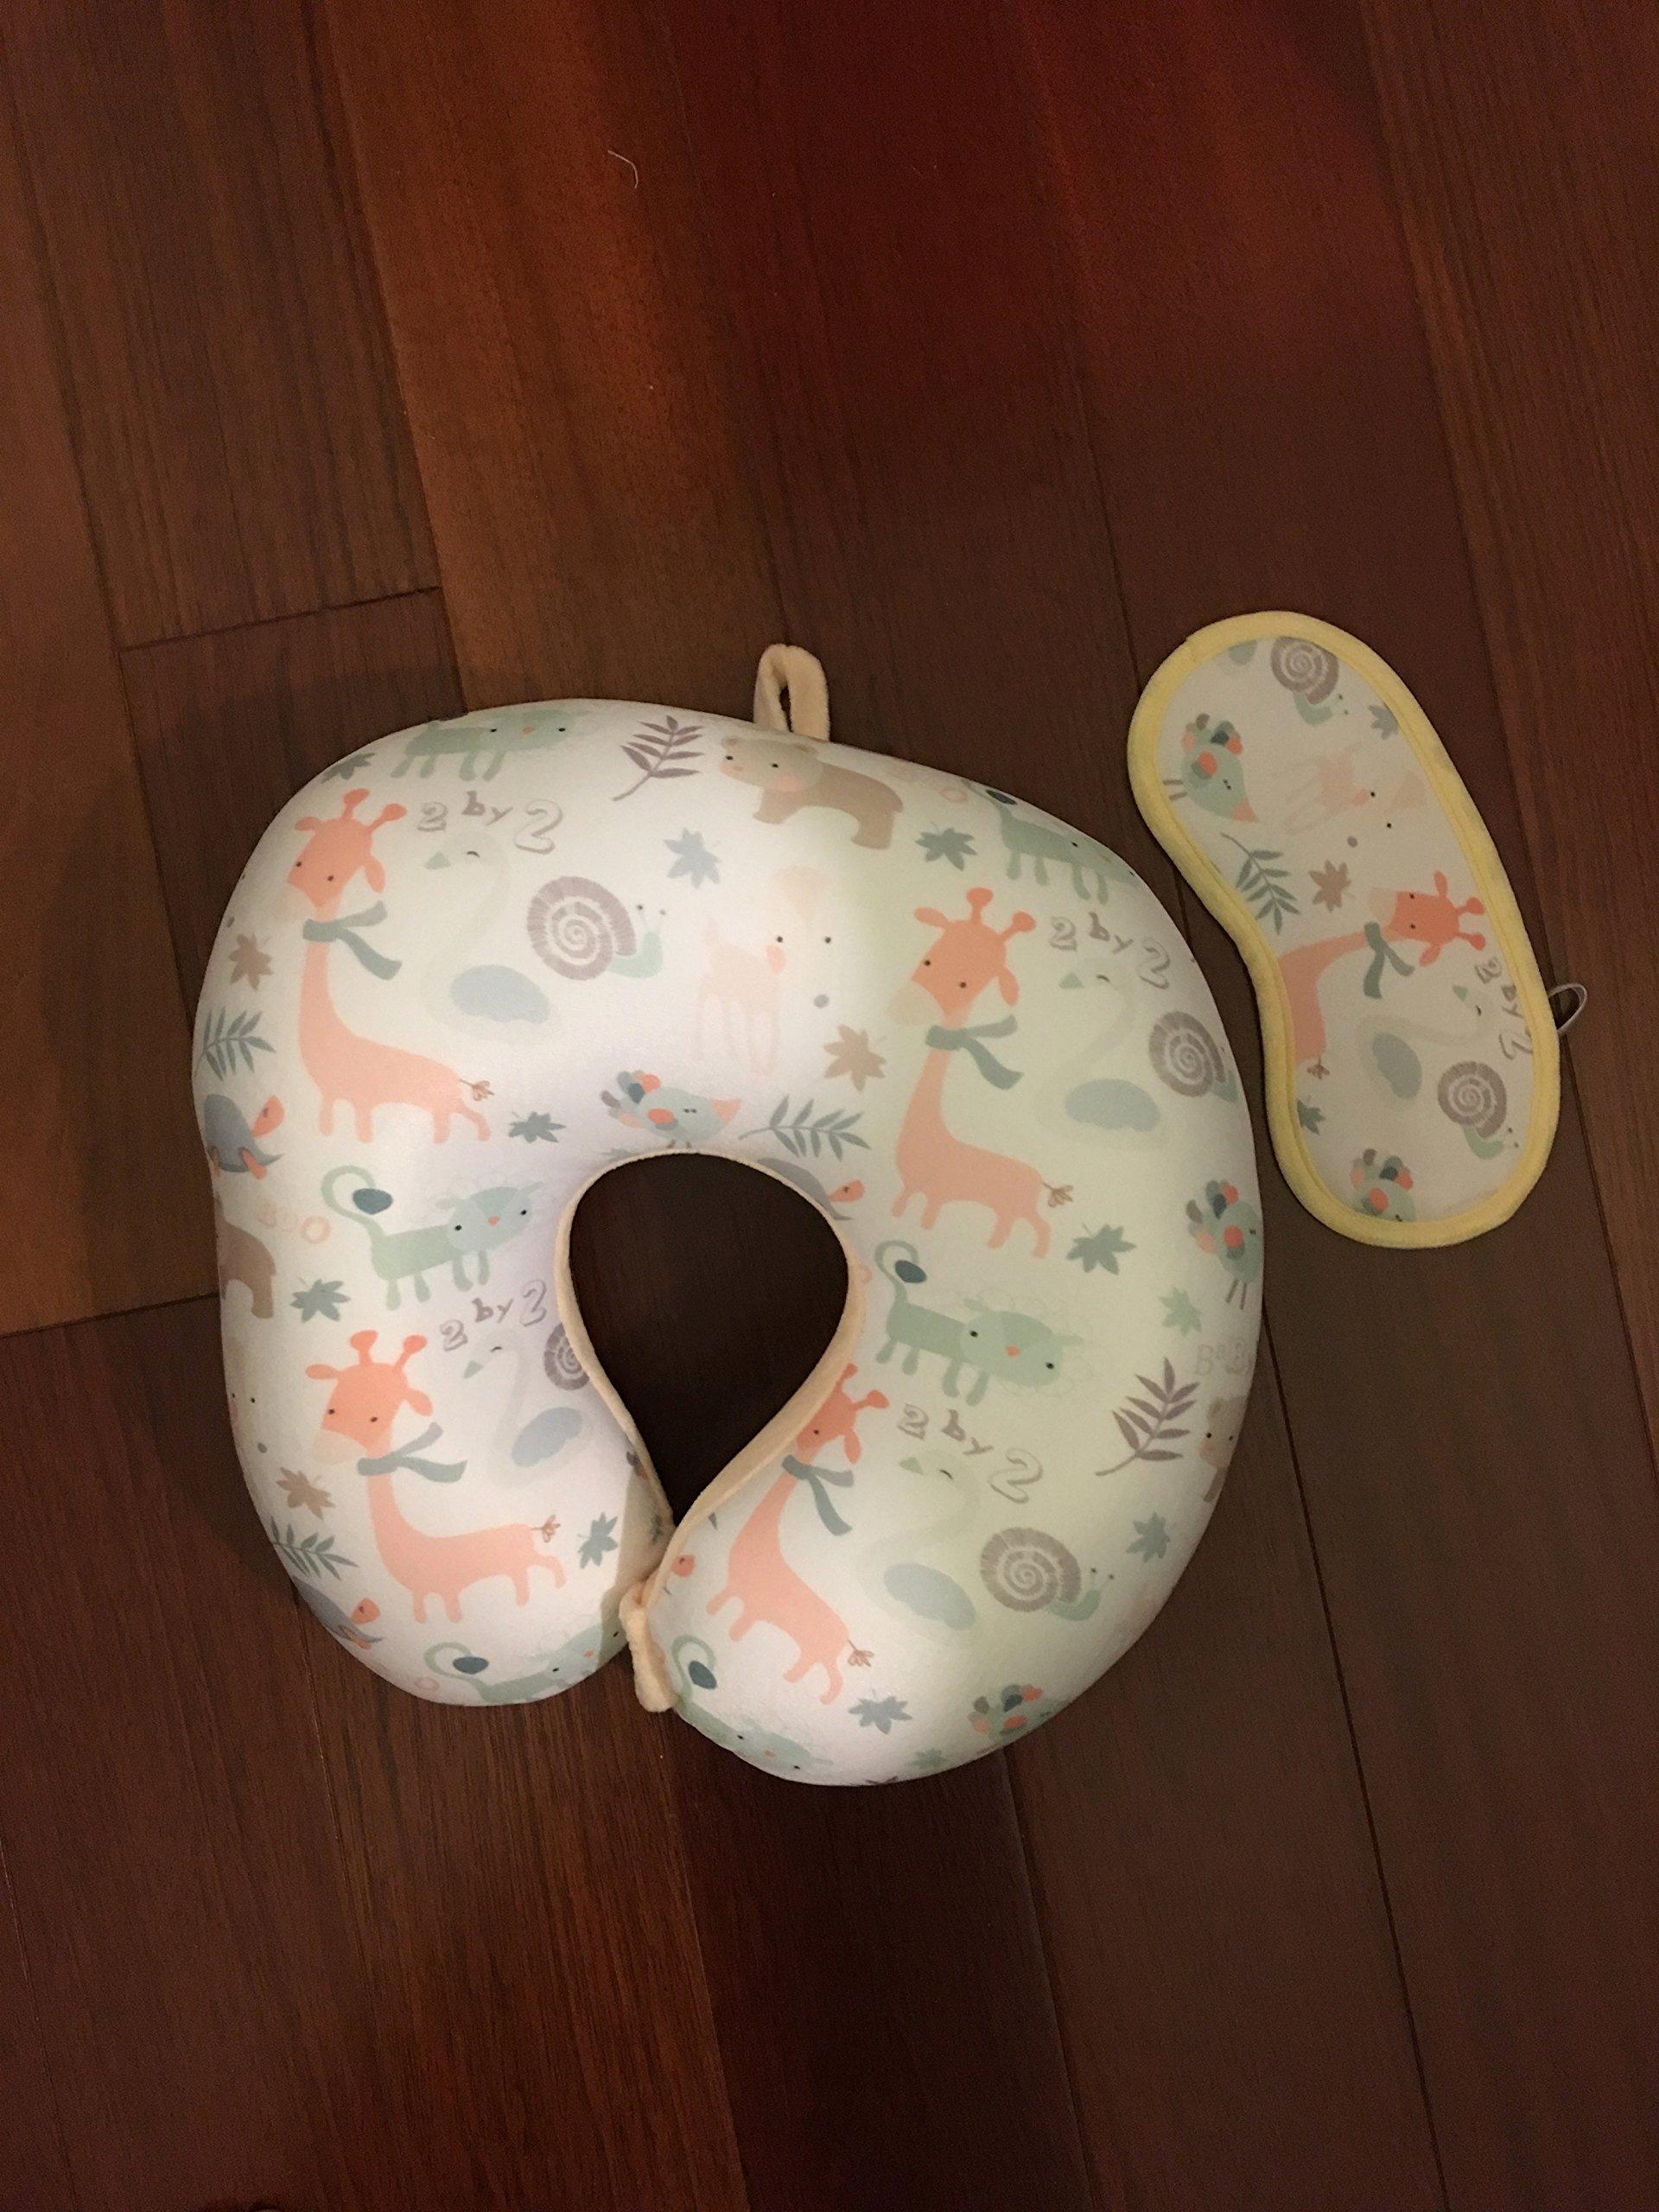 PurpleClay Soft Memory Foam Neck Pillow with Eye Mask (Animal/Peach)